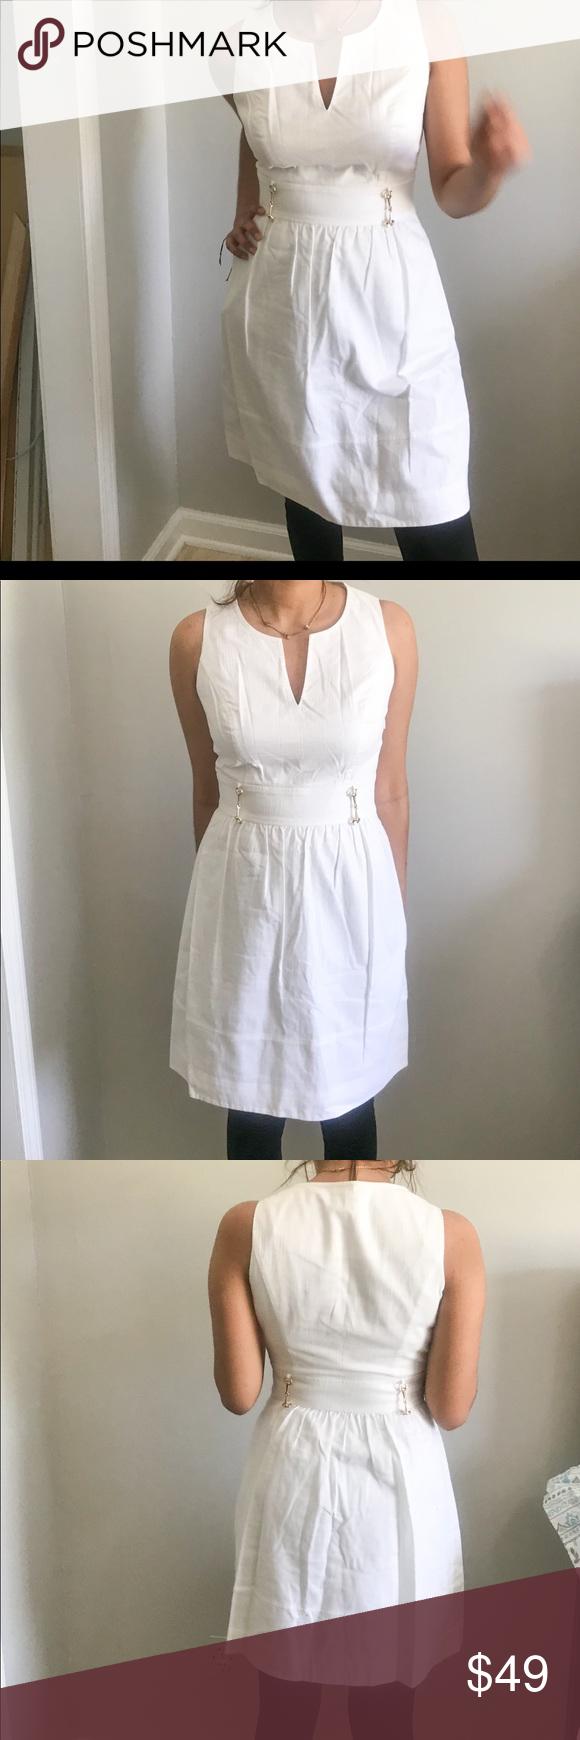 Vineyard Vines White Summer Dress Summer Dresses White Dress Summer Dresses [ 1740 x 580 Pixel ]